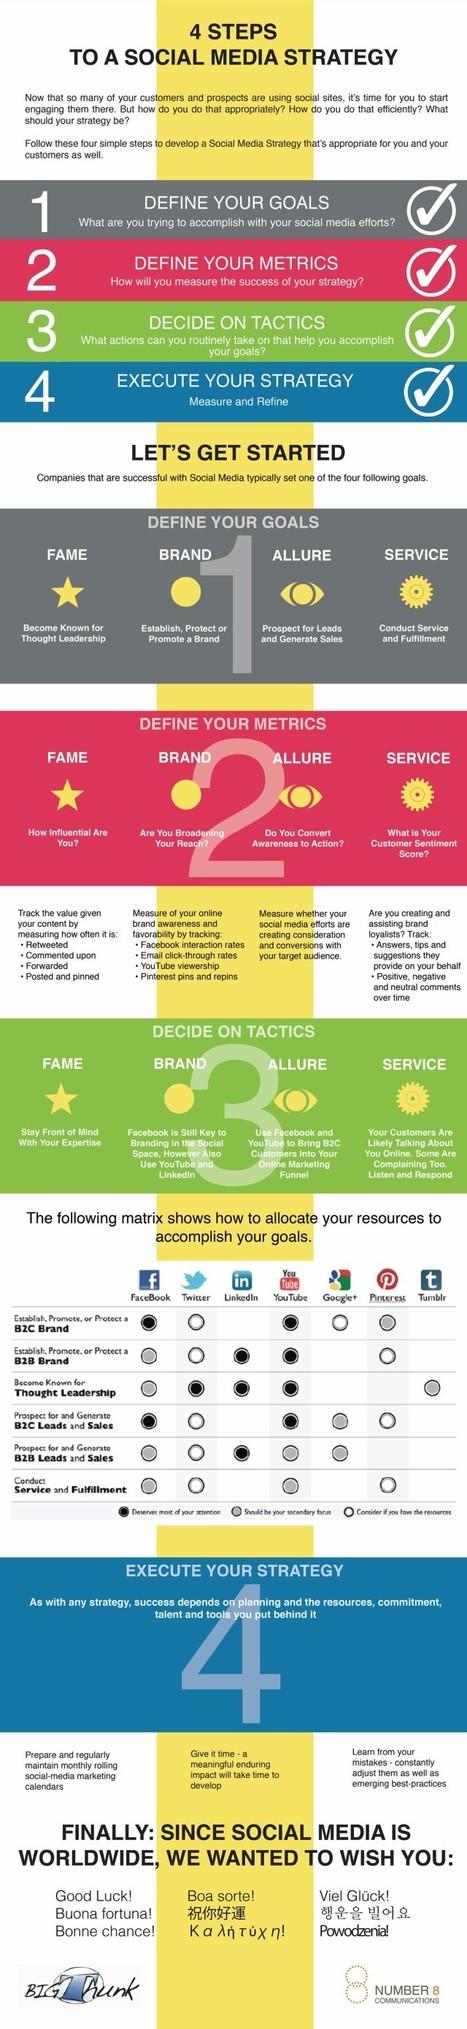 4 Steps to Social Media Marketing | Social Media Today | Social Media Useful Info | Scoop.it